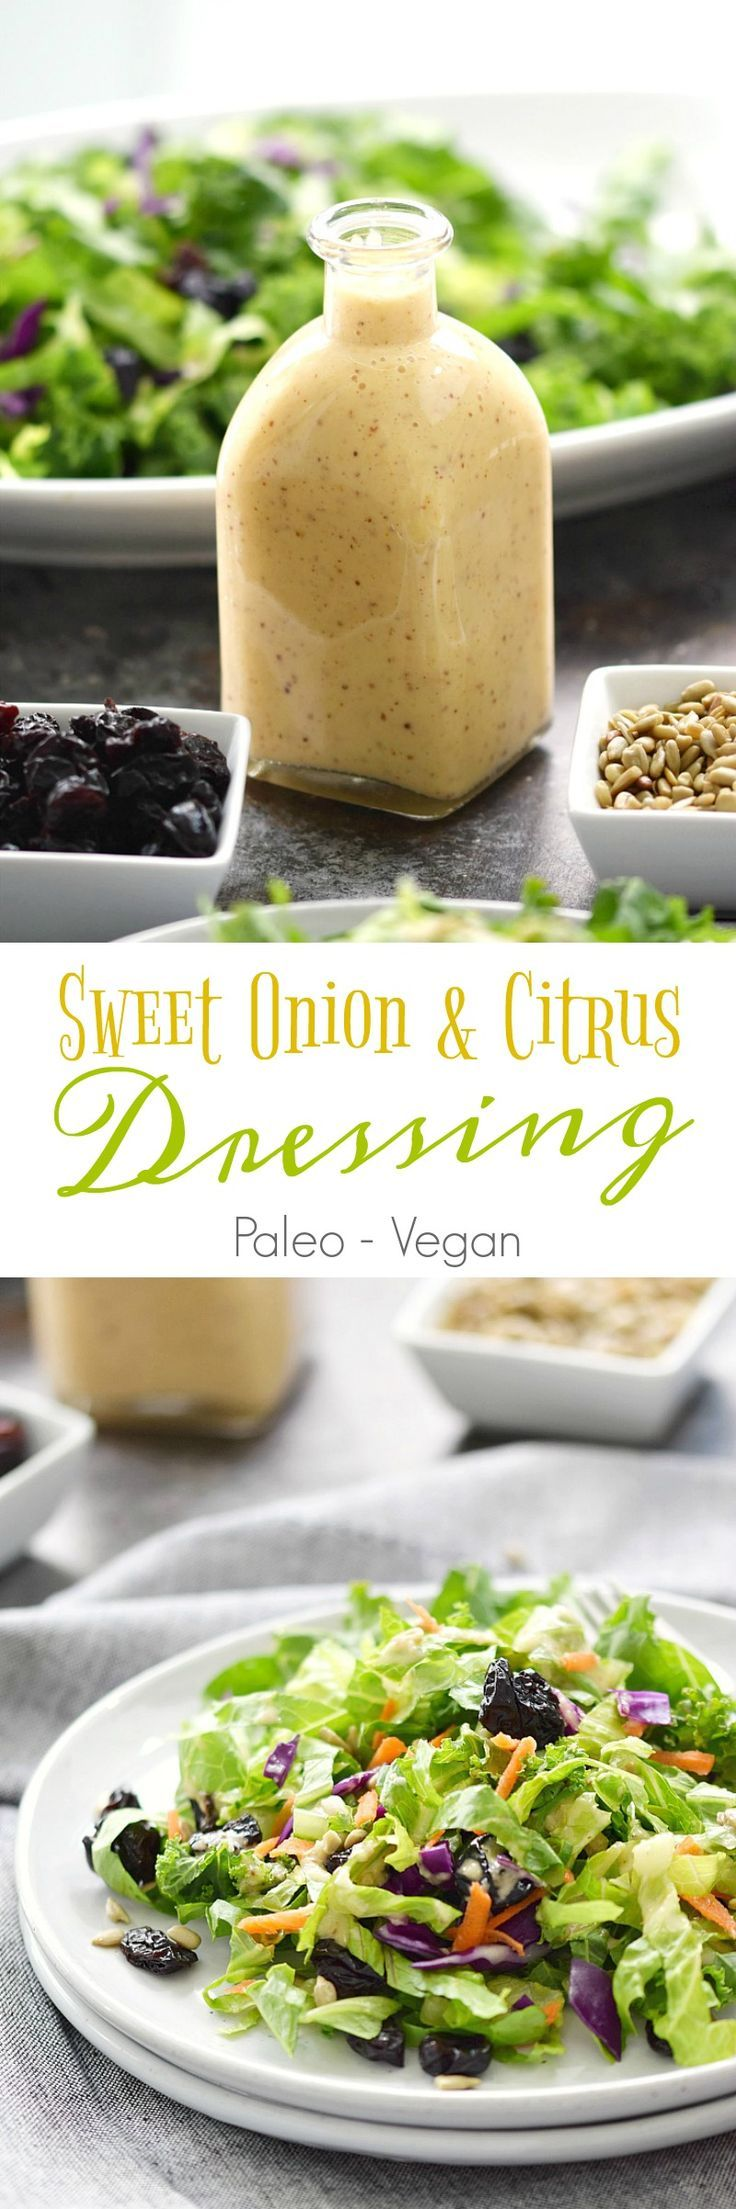 23+ Citrus sweet onion dressing inspirations